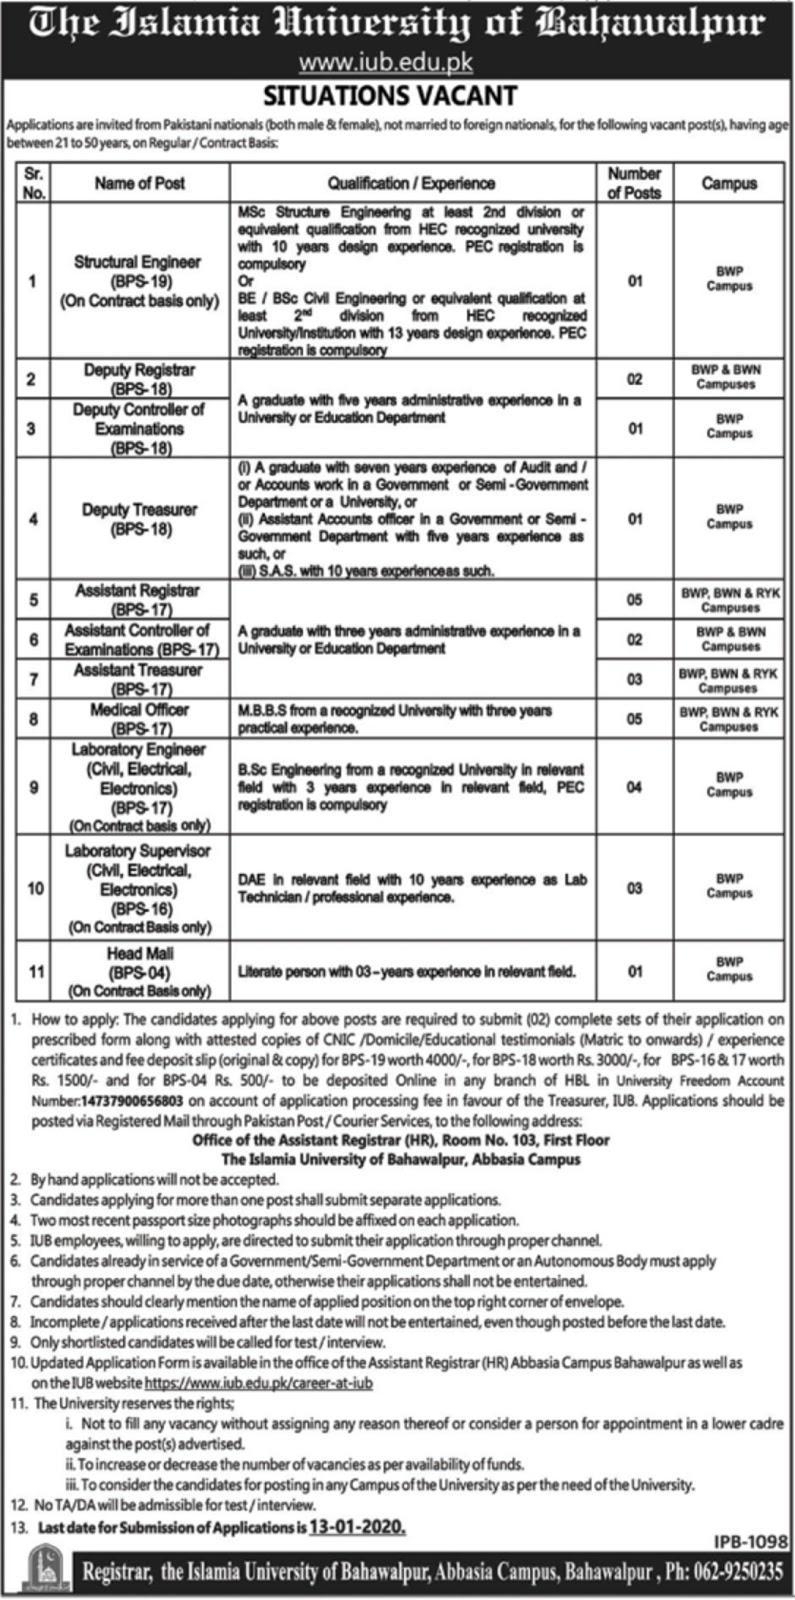 Latest IUB Bahawalpur Jobs 2019 Islamia University of Bahawalpur Apply Online